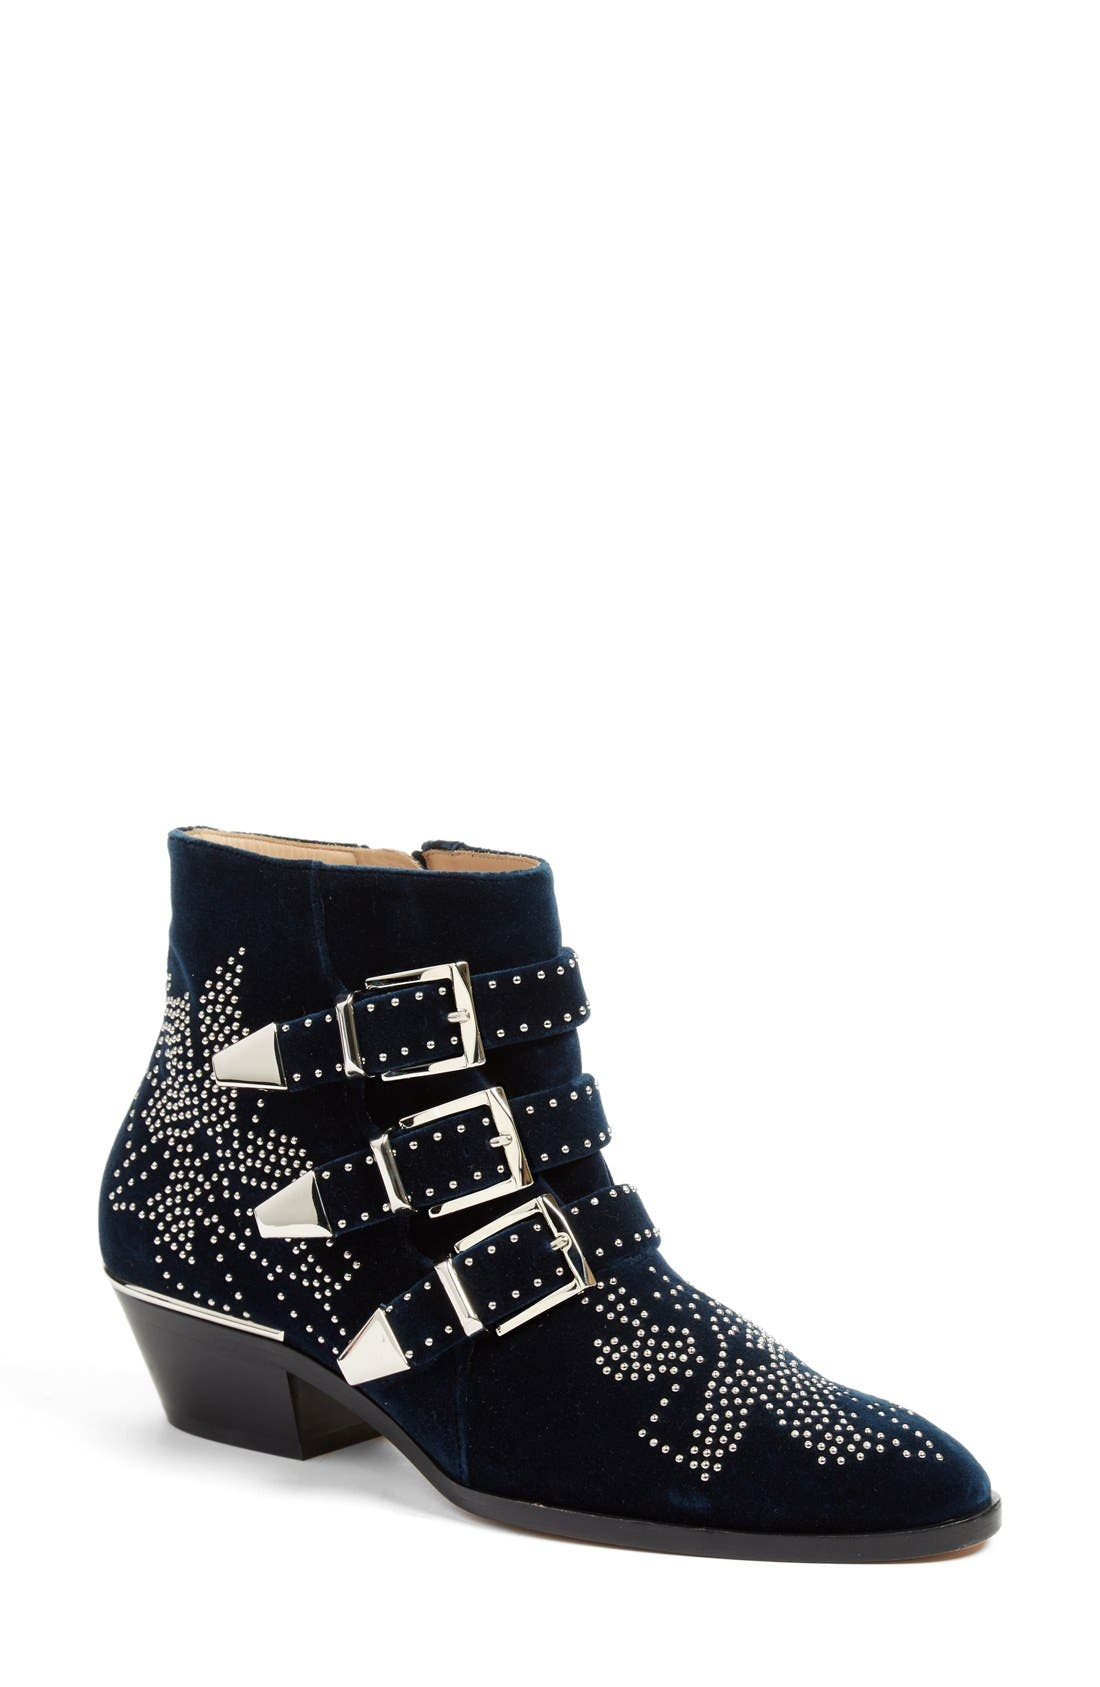 Main Image - Chloé 'Susan' Studded Buckle Boot (Women)